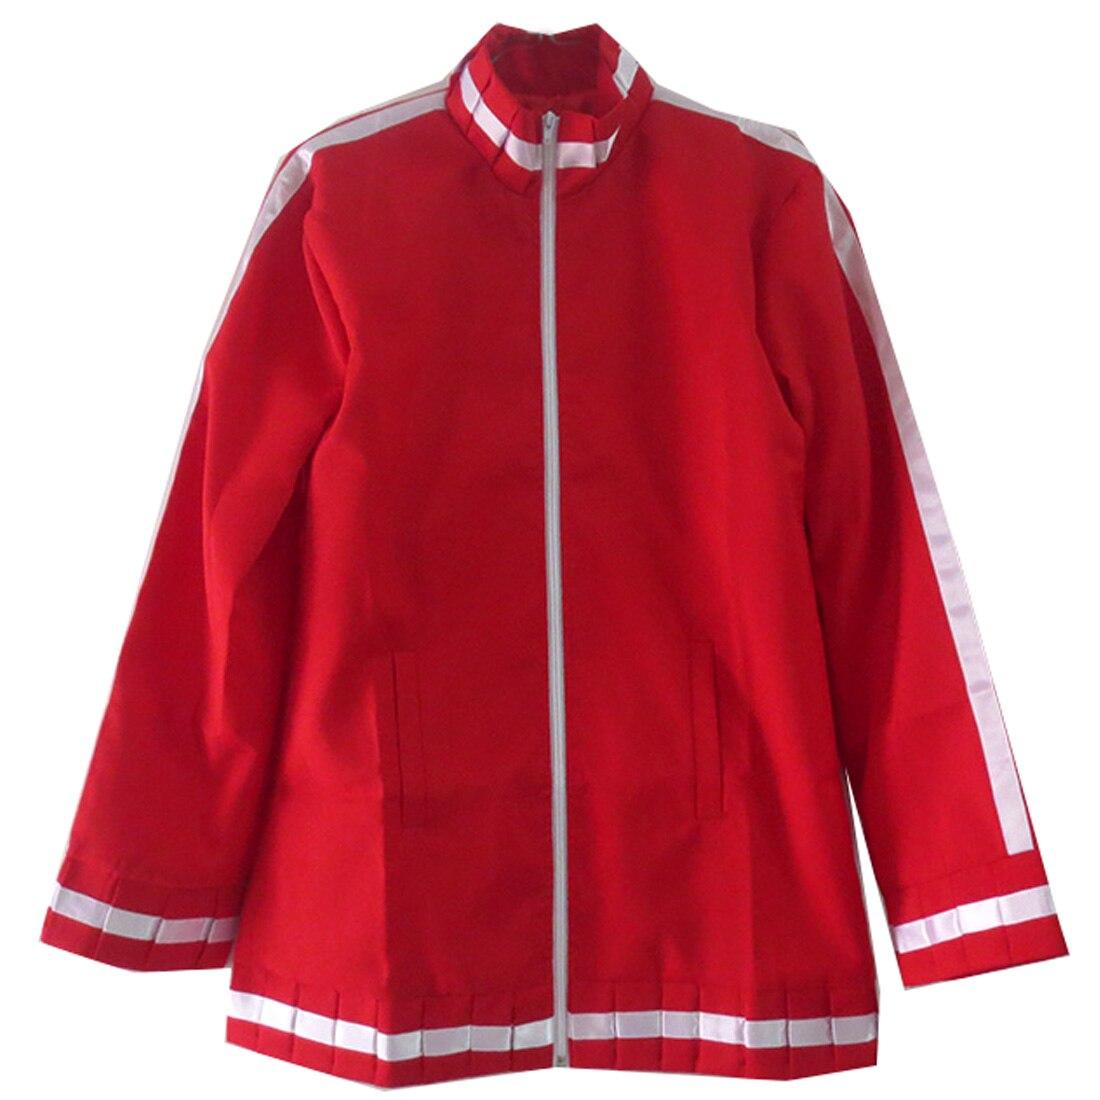 2021 gabriel deixar cair gabriel branco tenma casaco jaqueta festa de natal halloween uniforme outfit cosplay traje personalizar qualquer tamanho